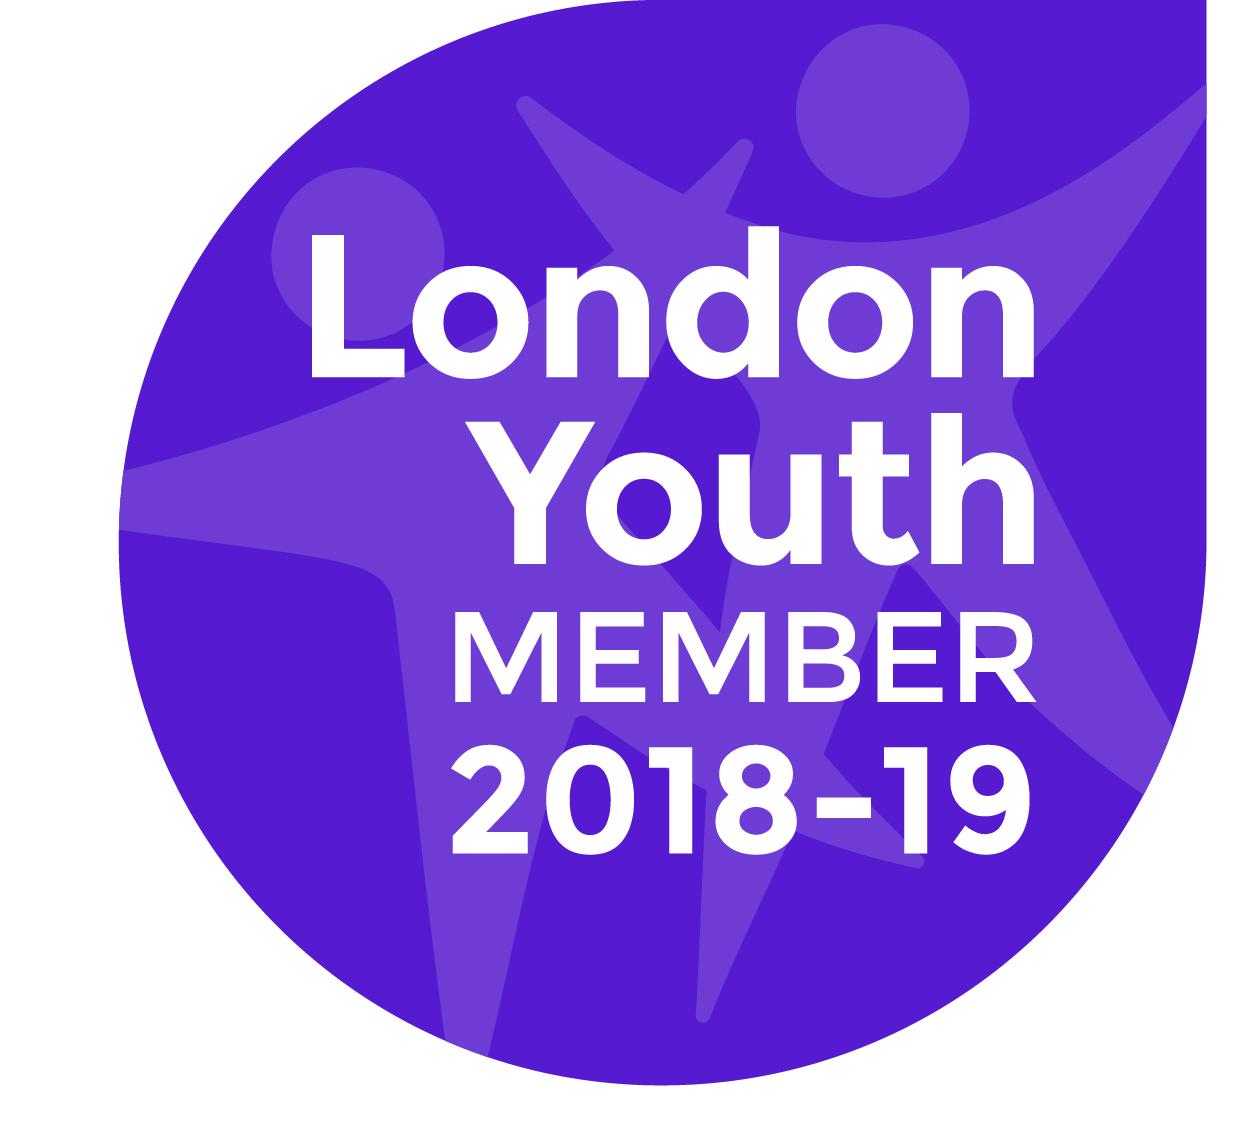 Member 2018-19.jpeg web.jpg